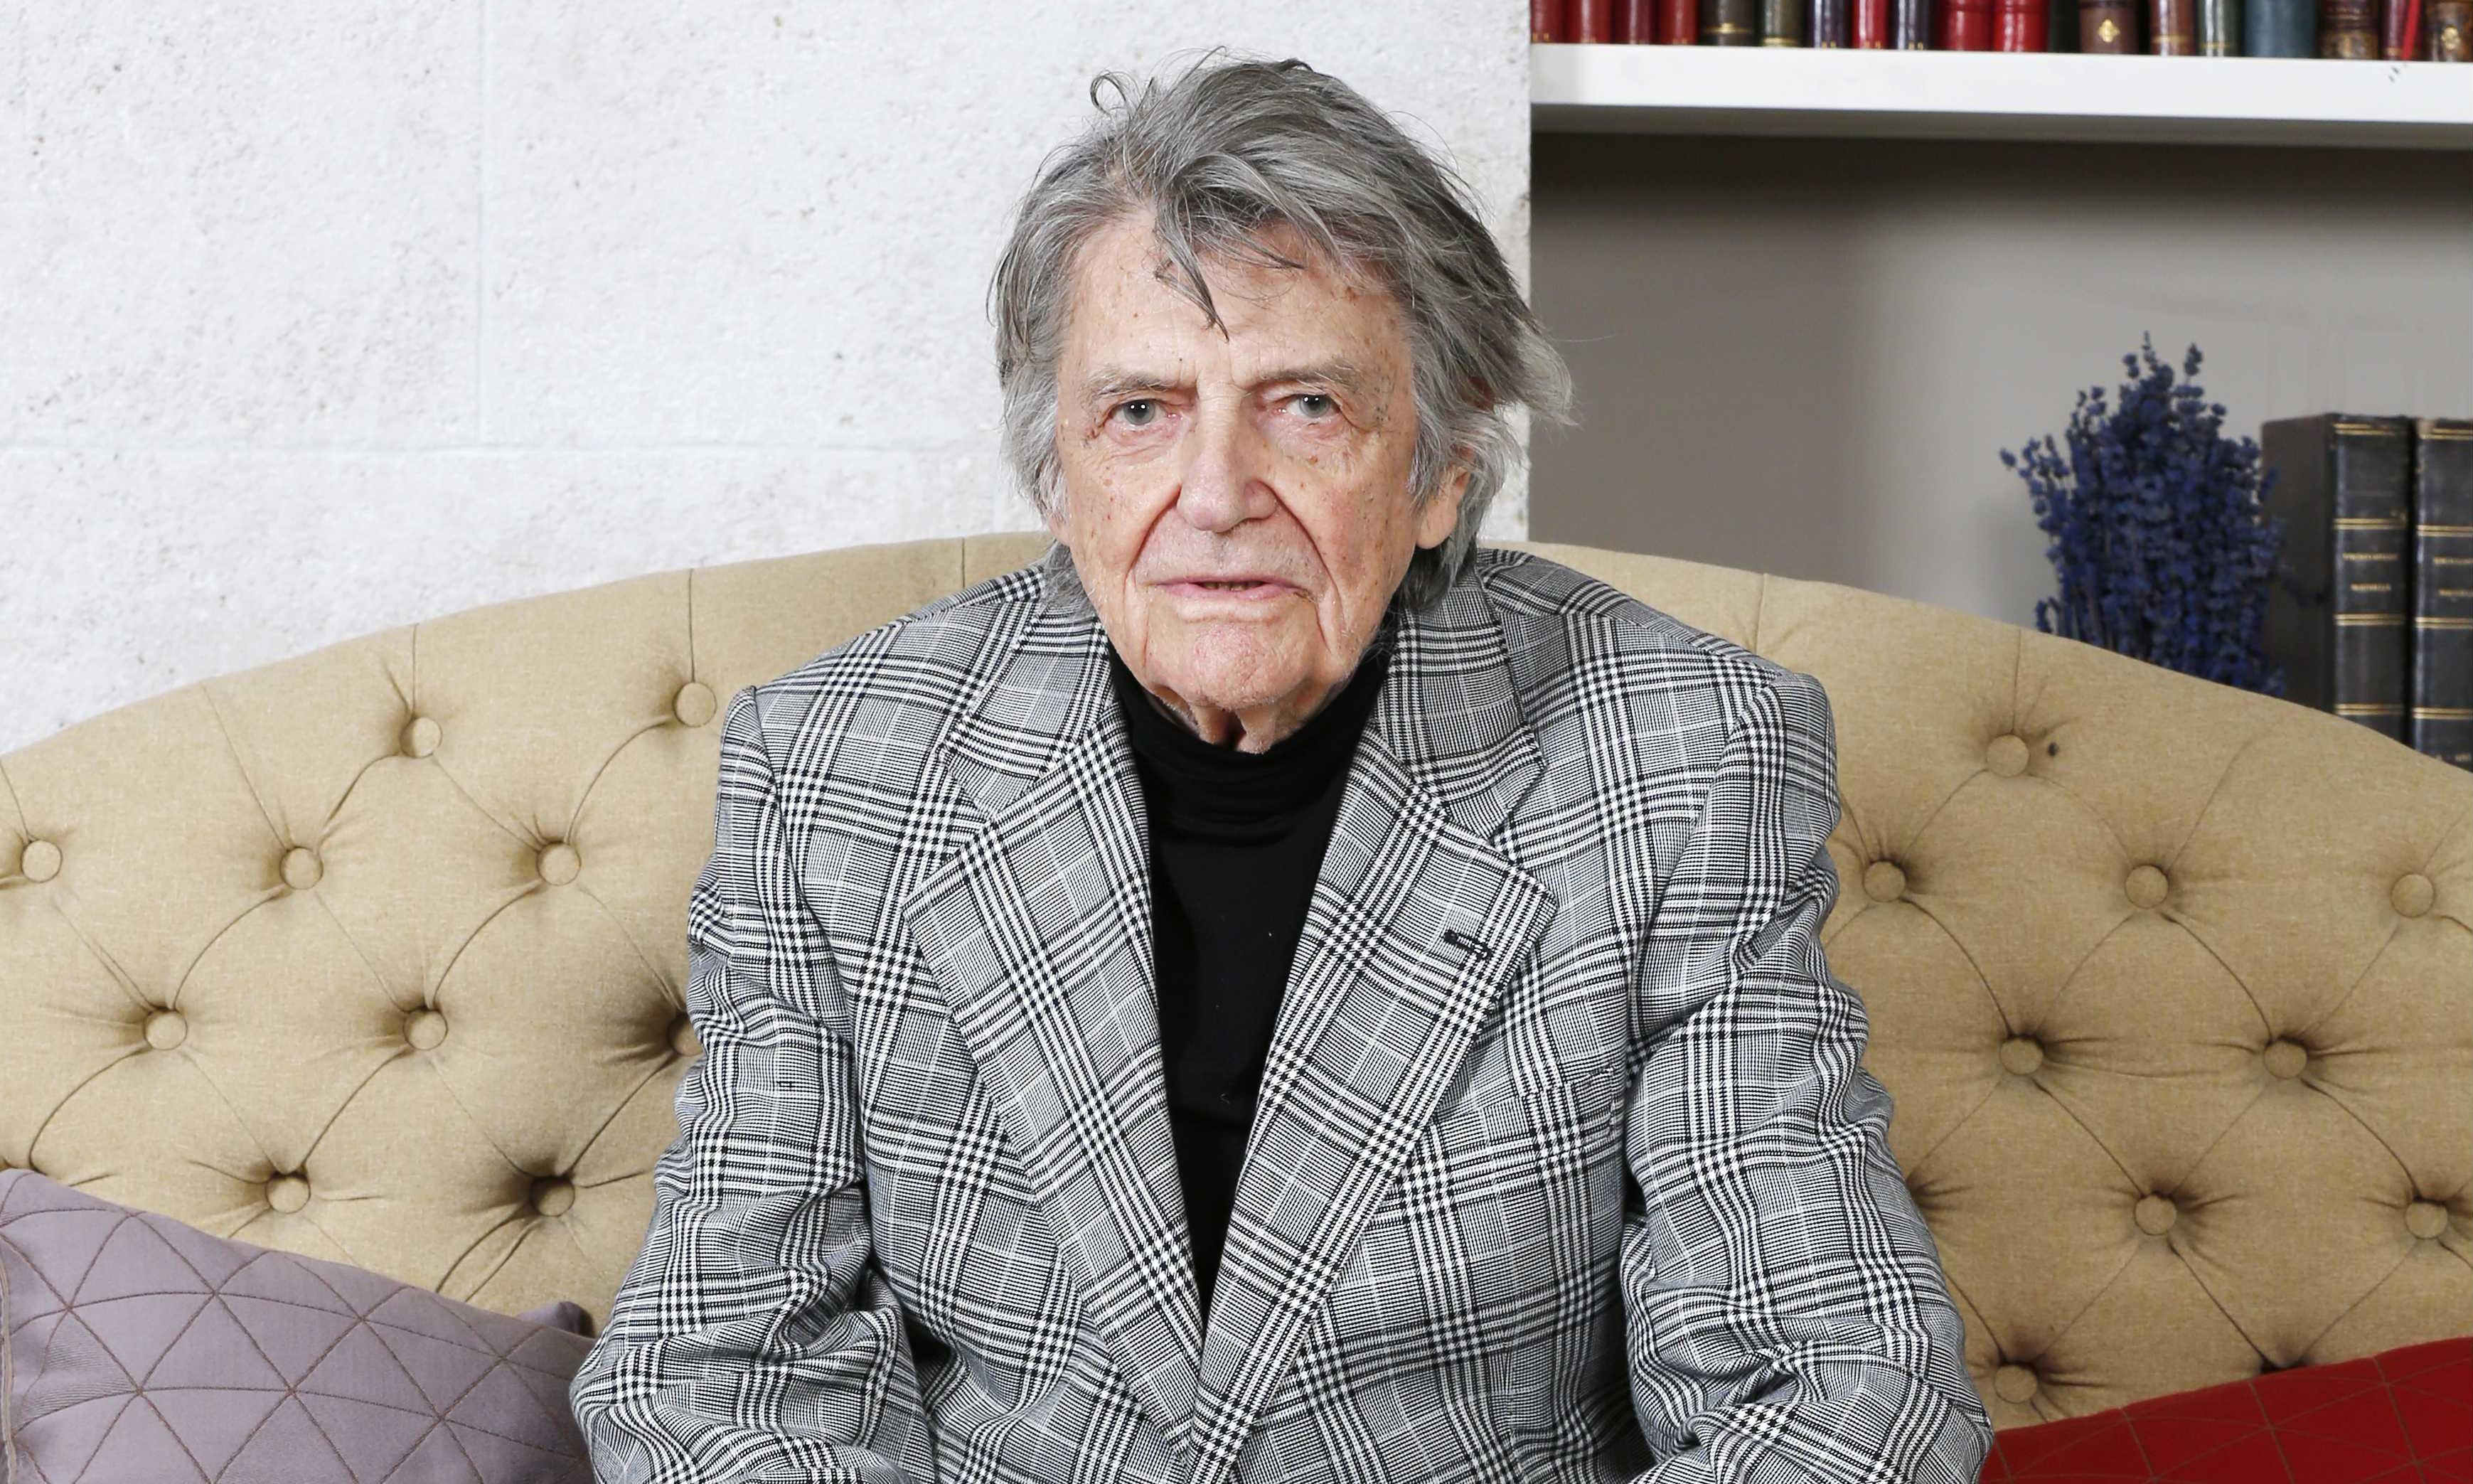 Jean-Pierre Mocky obituary